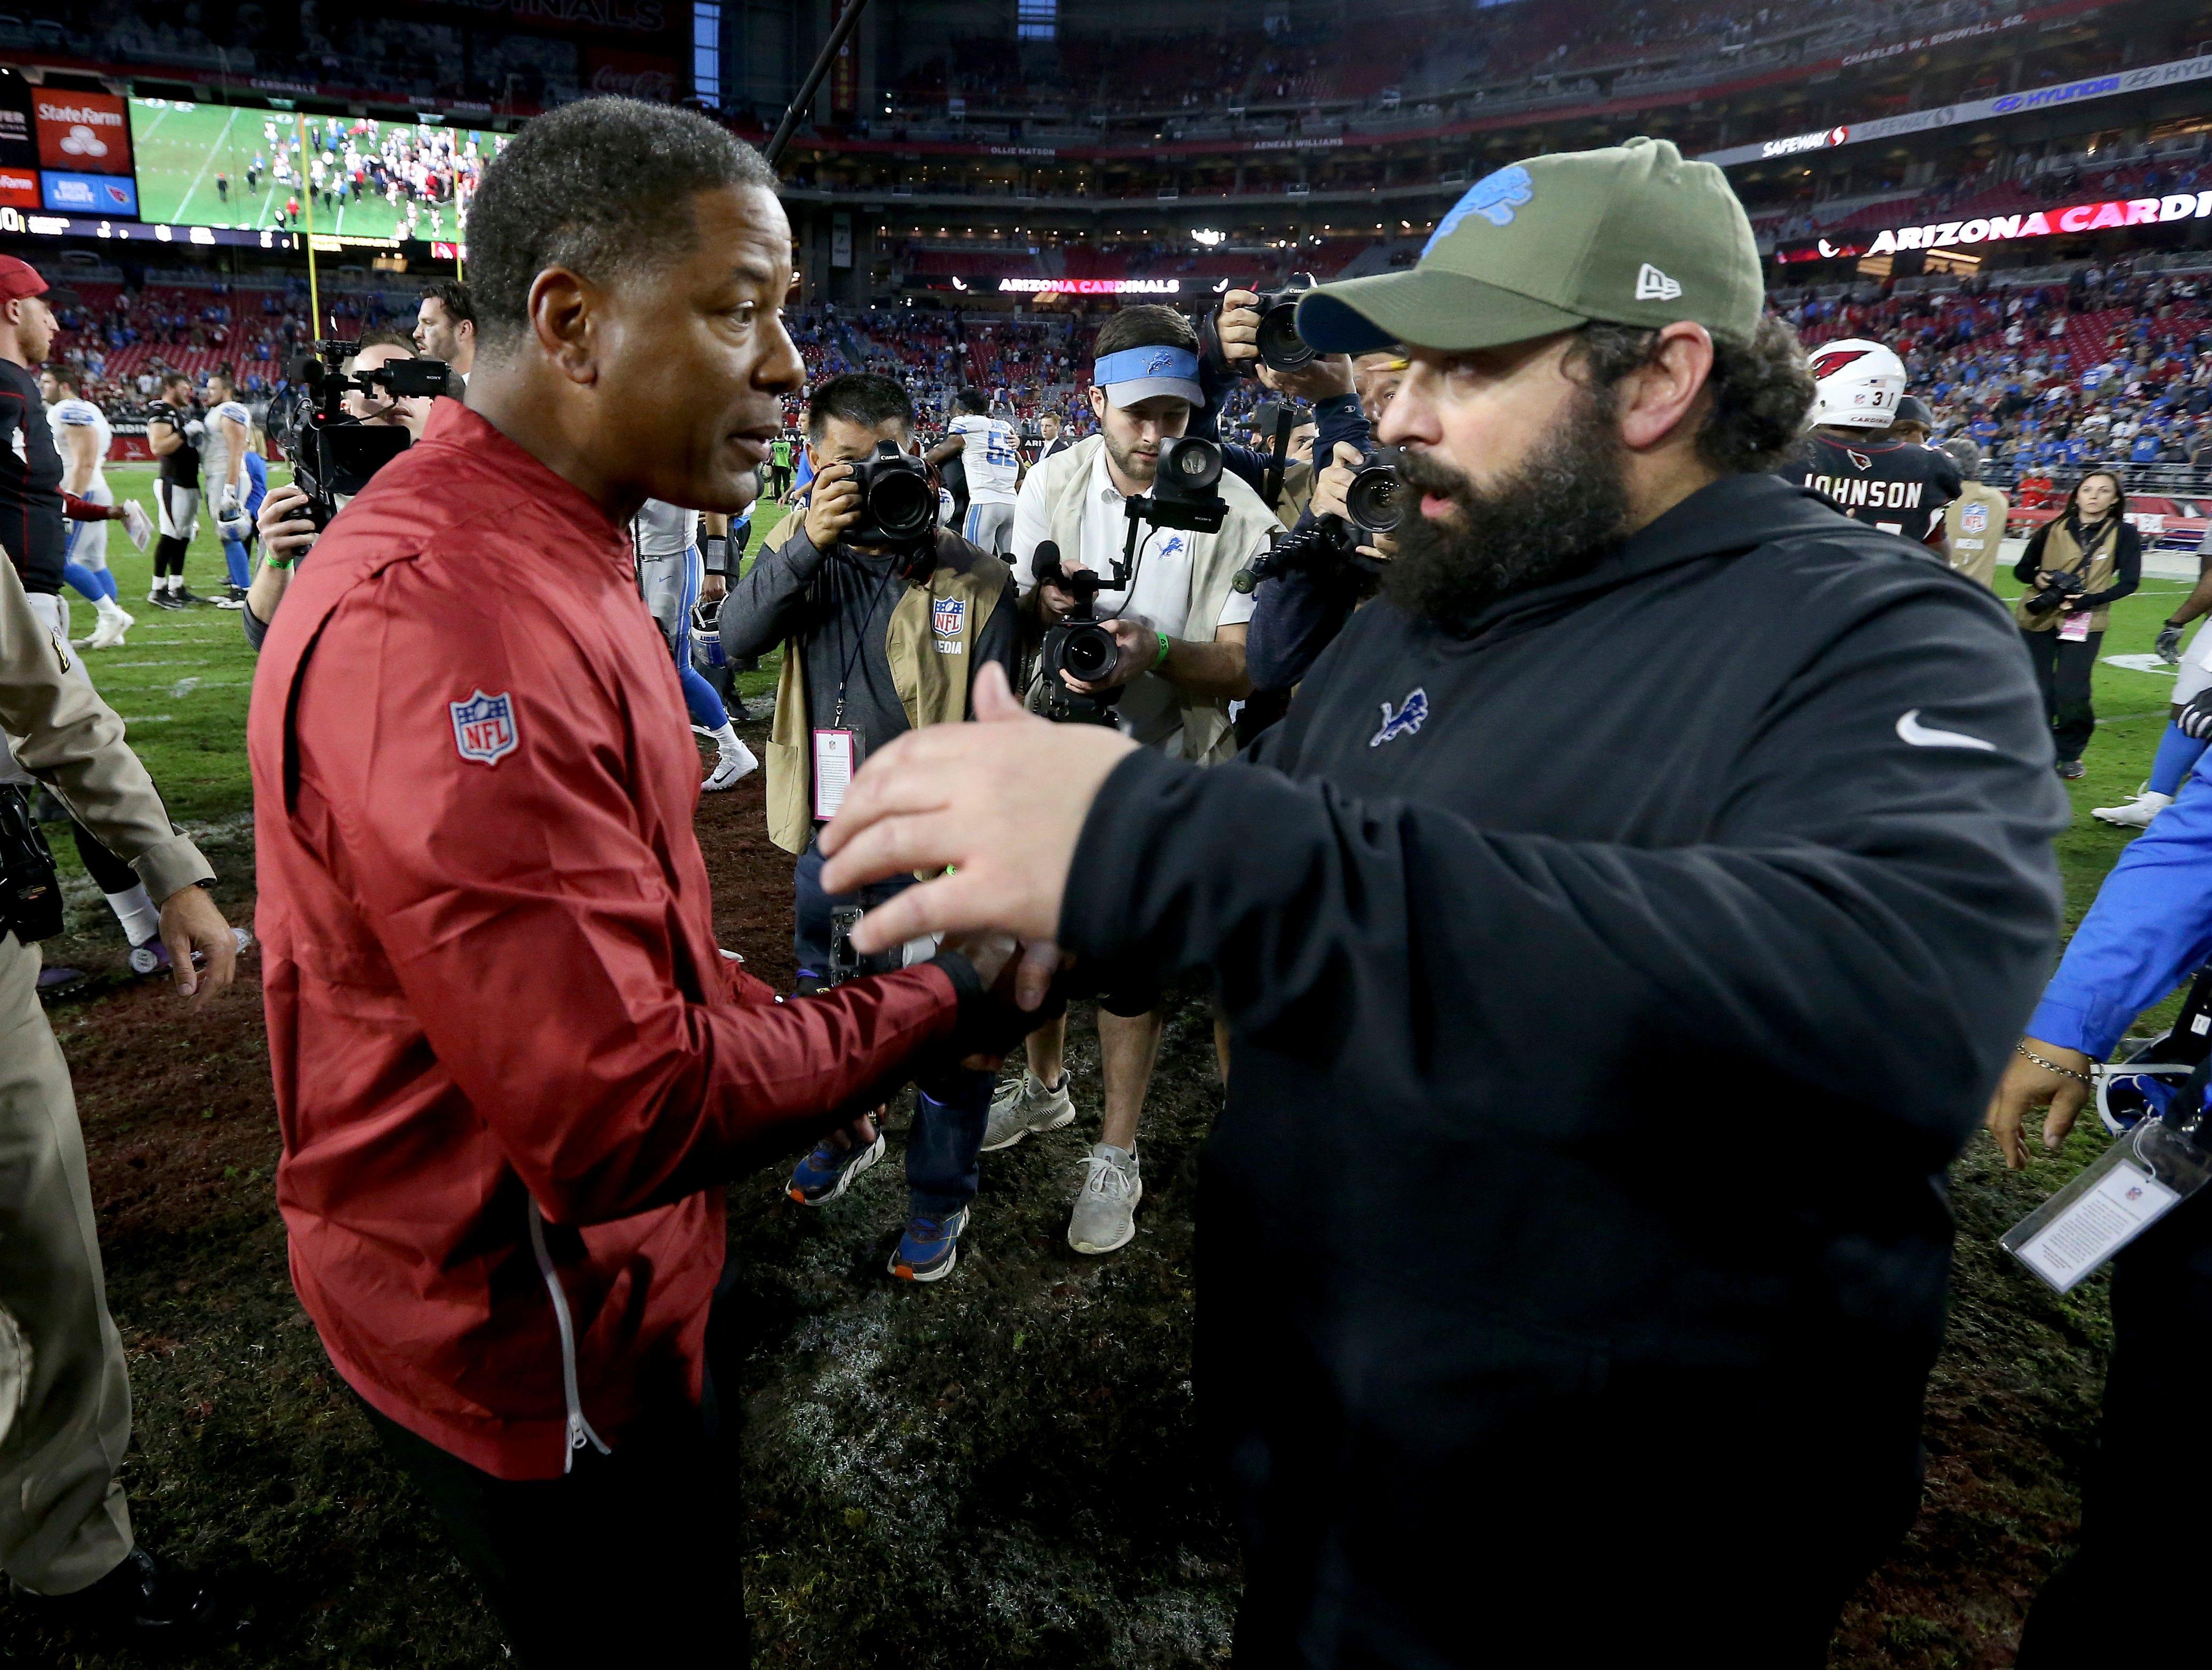 Arizona Cardinals head coach Steve Wilks. left, greets Detroit Lions head coach Matt Patricia after the game.